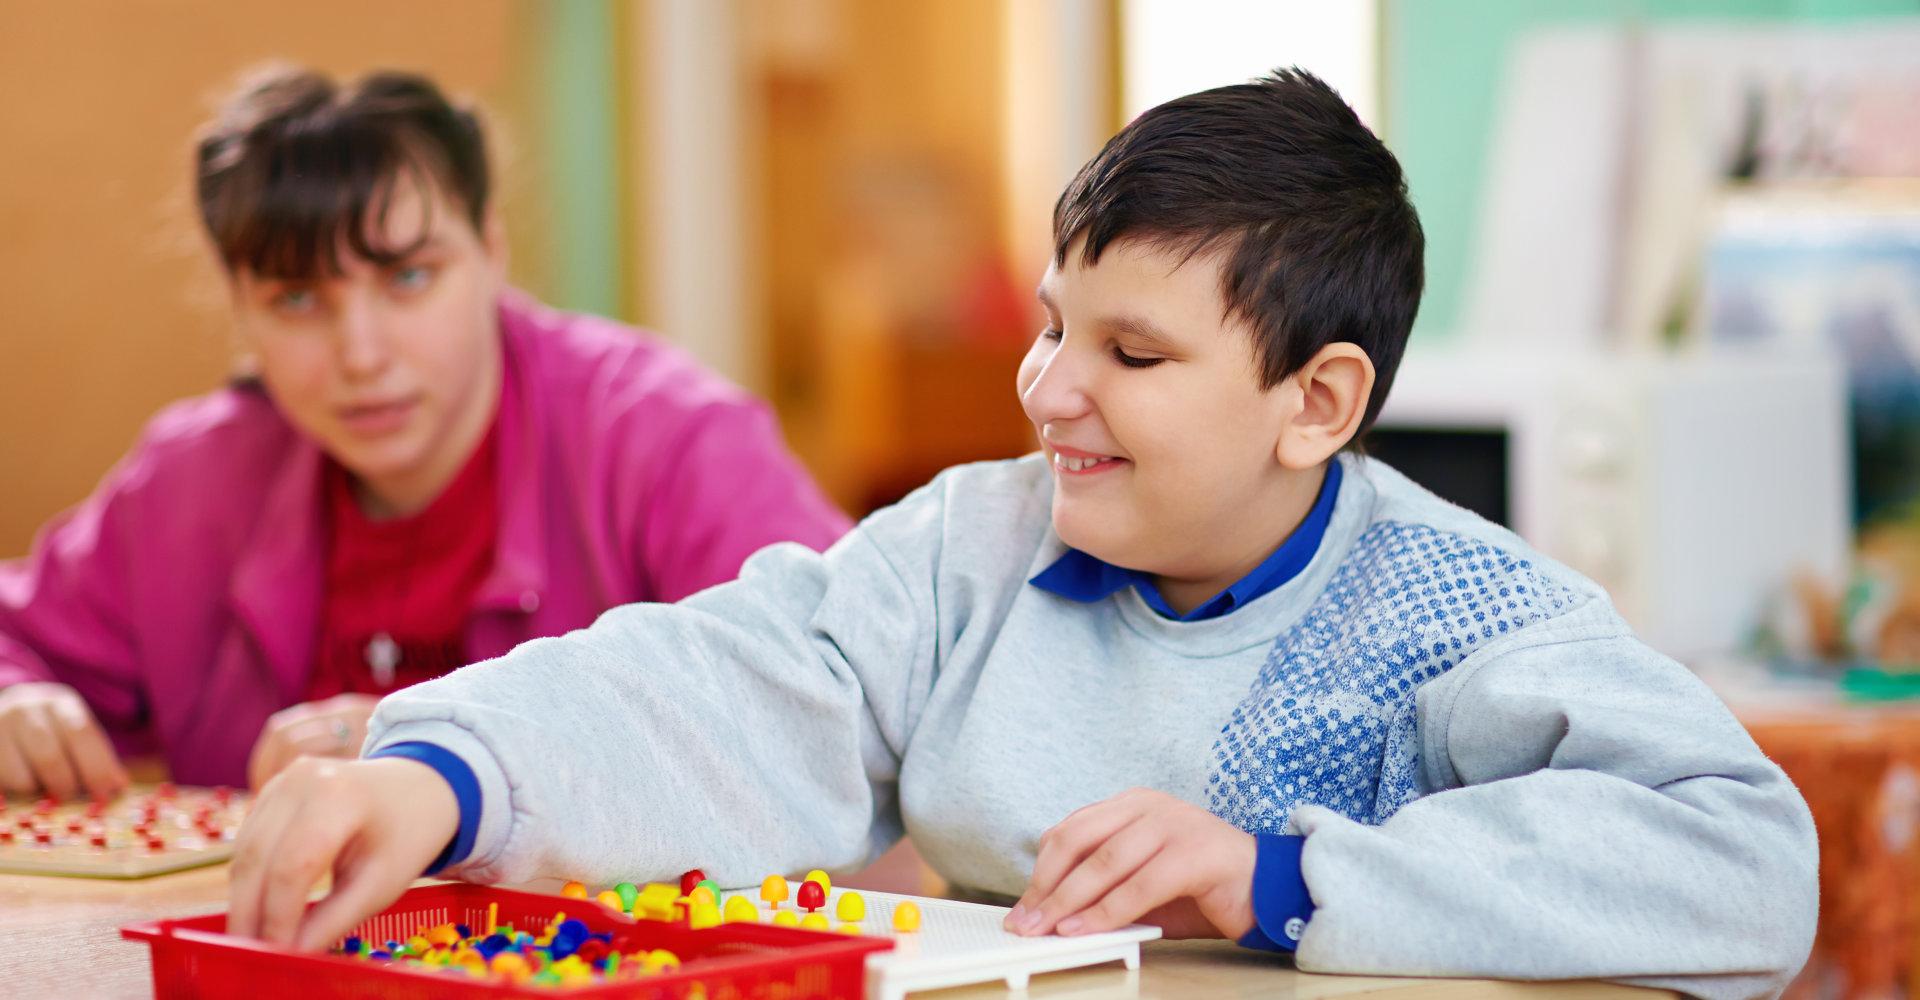 kids playing board games